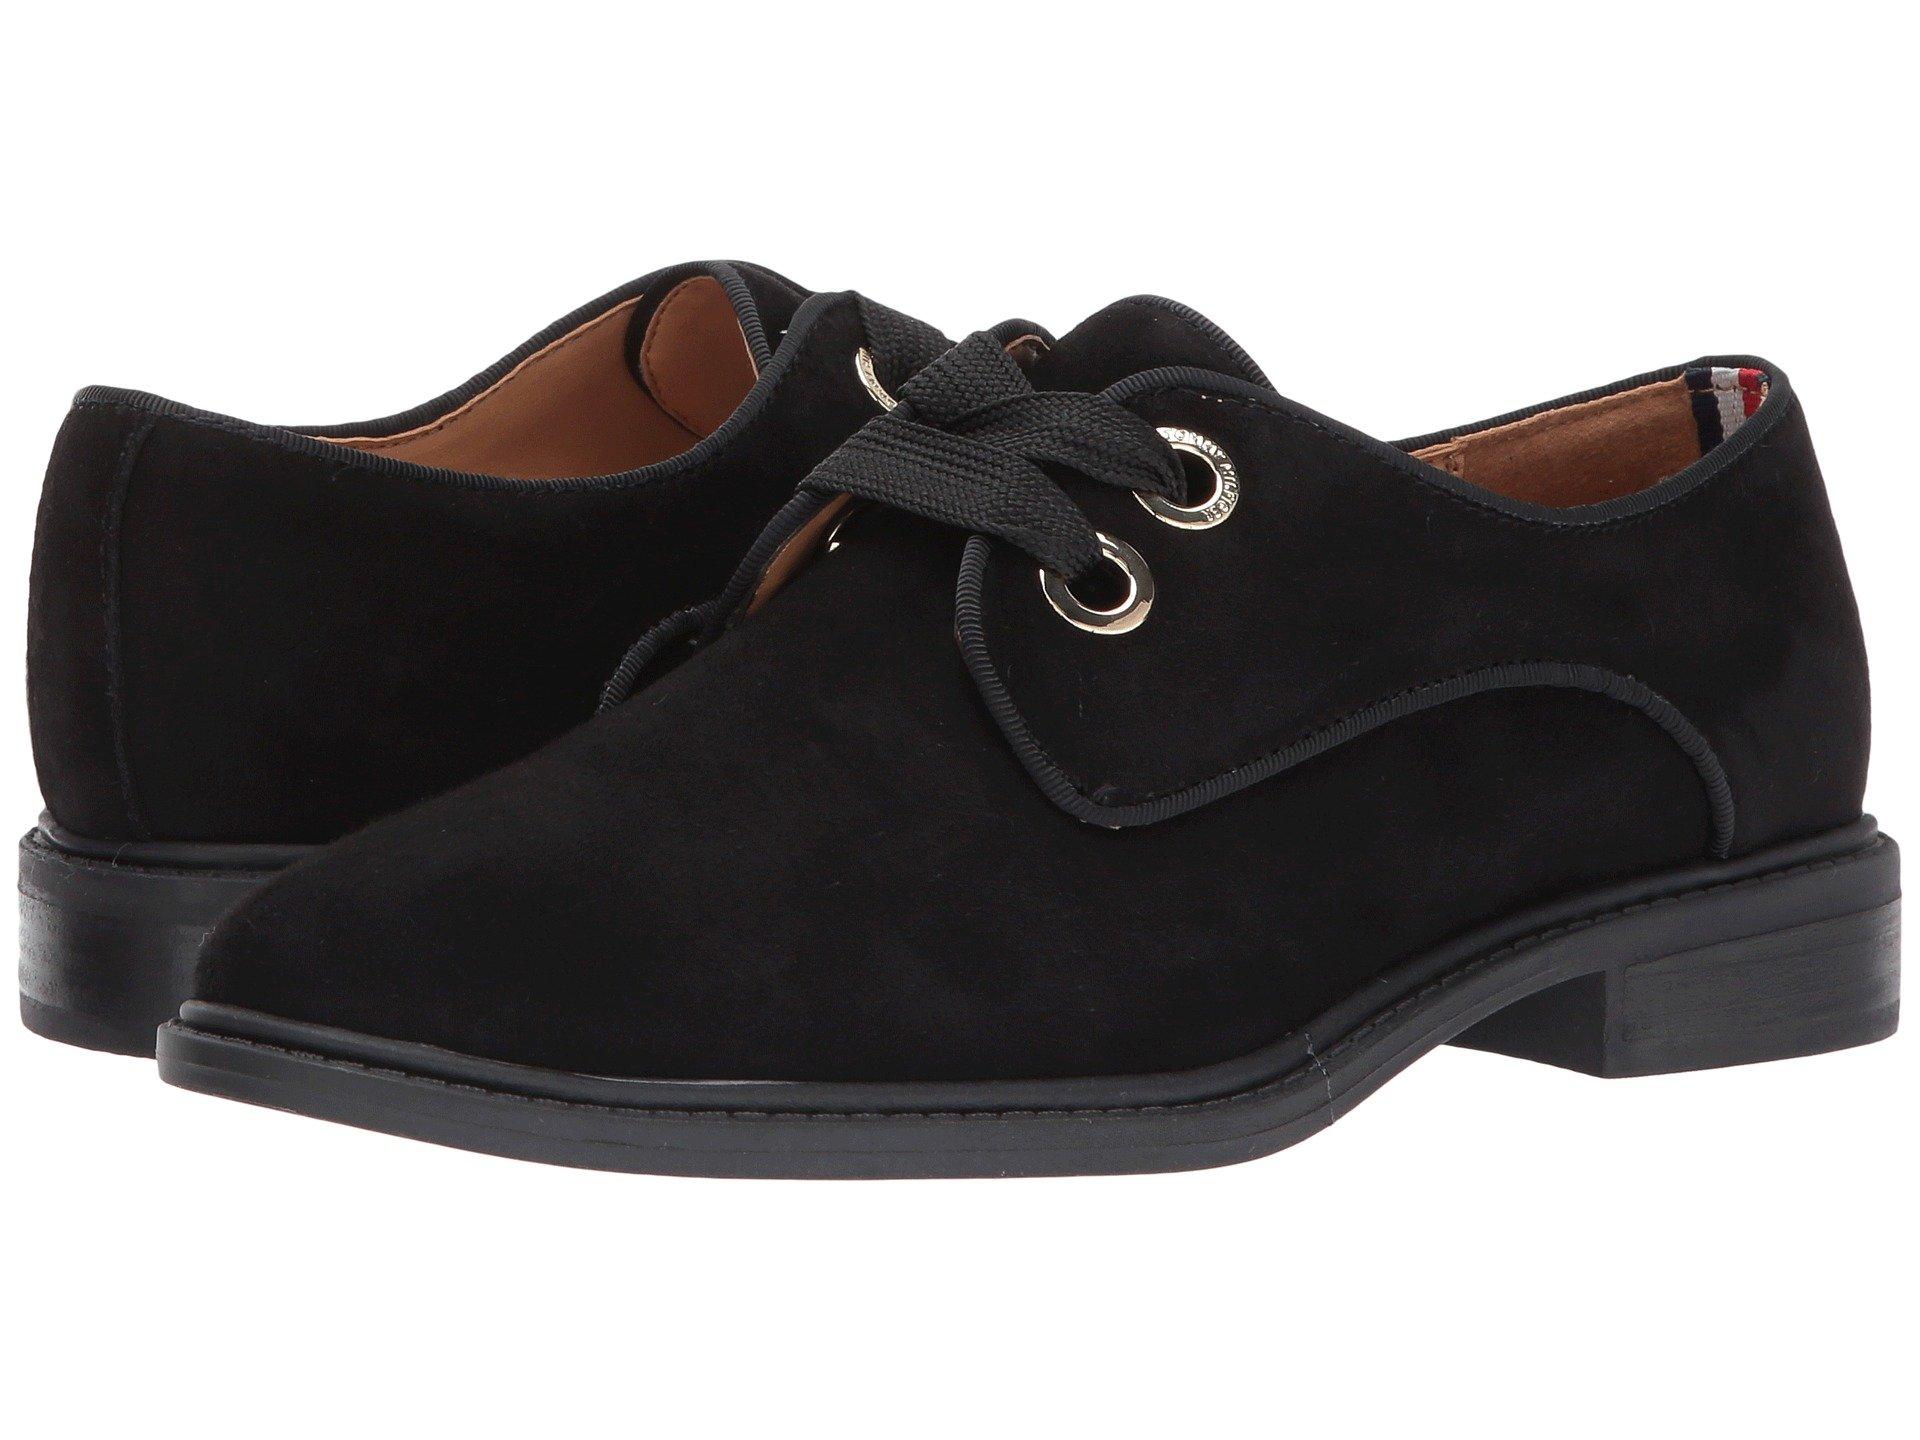 Zapato Casual para Mujer Tommy Hilfiger Jouston  + Tommy Hilfiger en VeoyCompro.net